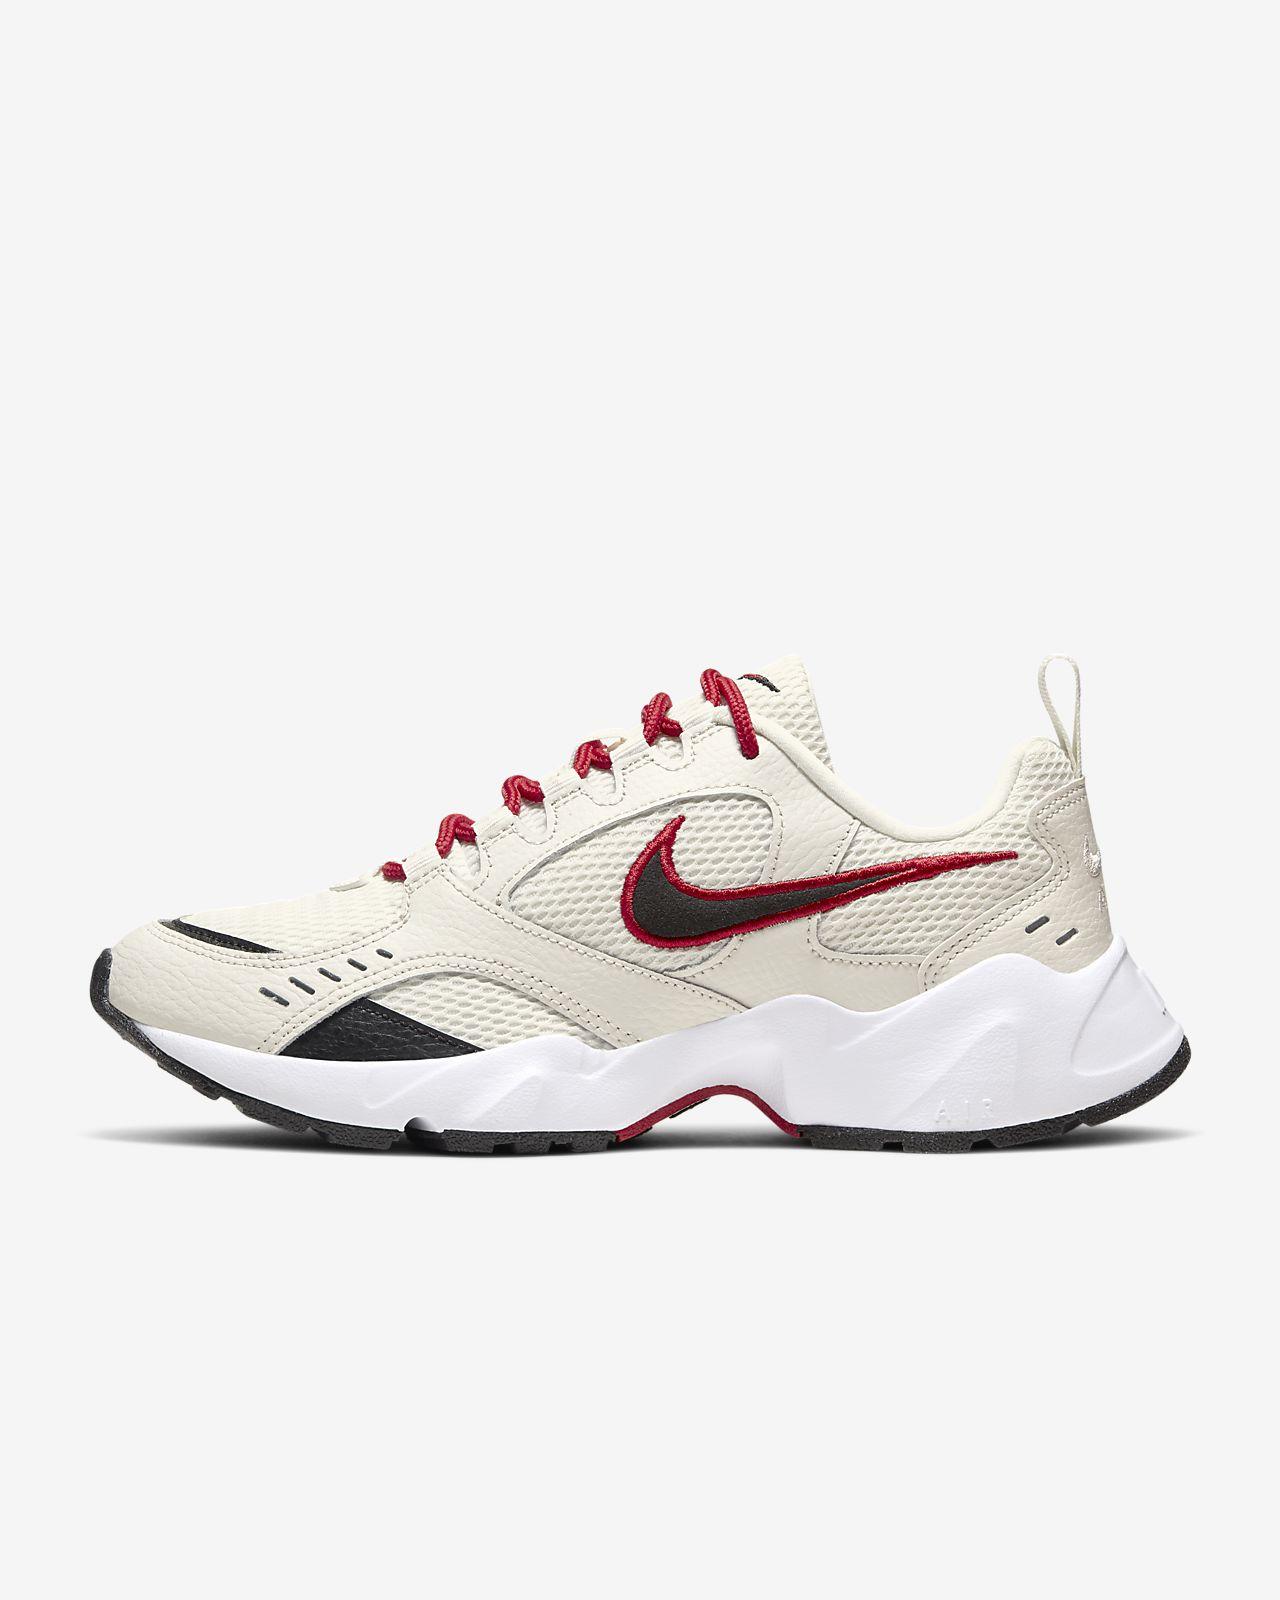 Brandneu Original Nike AIR PRESTO Frauen Retro Mesh